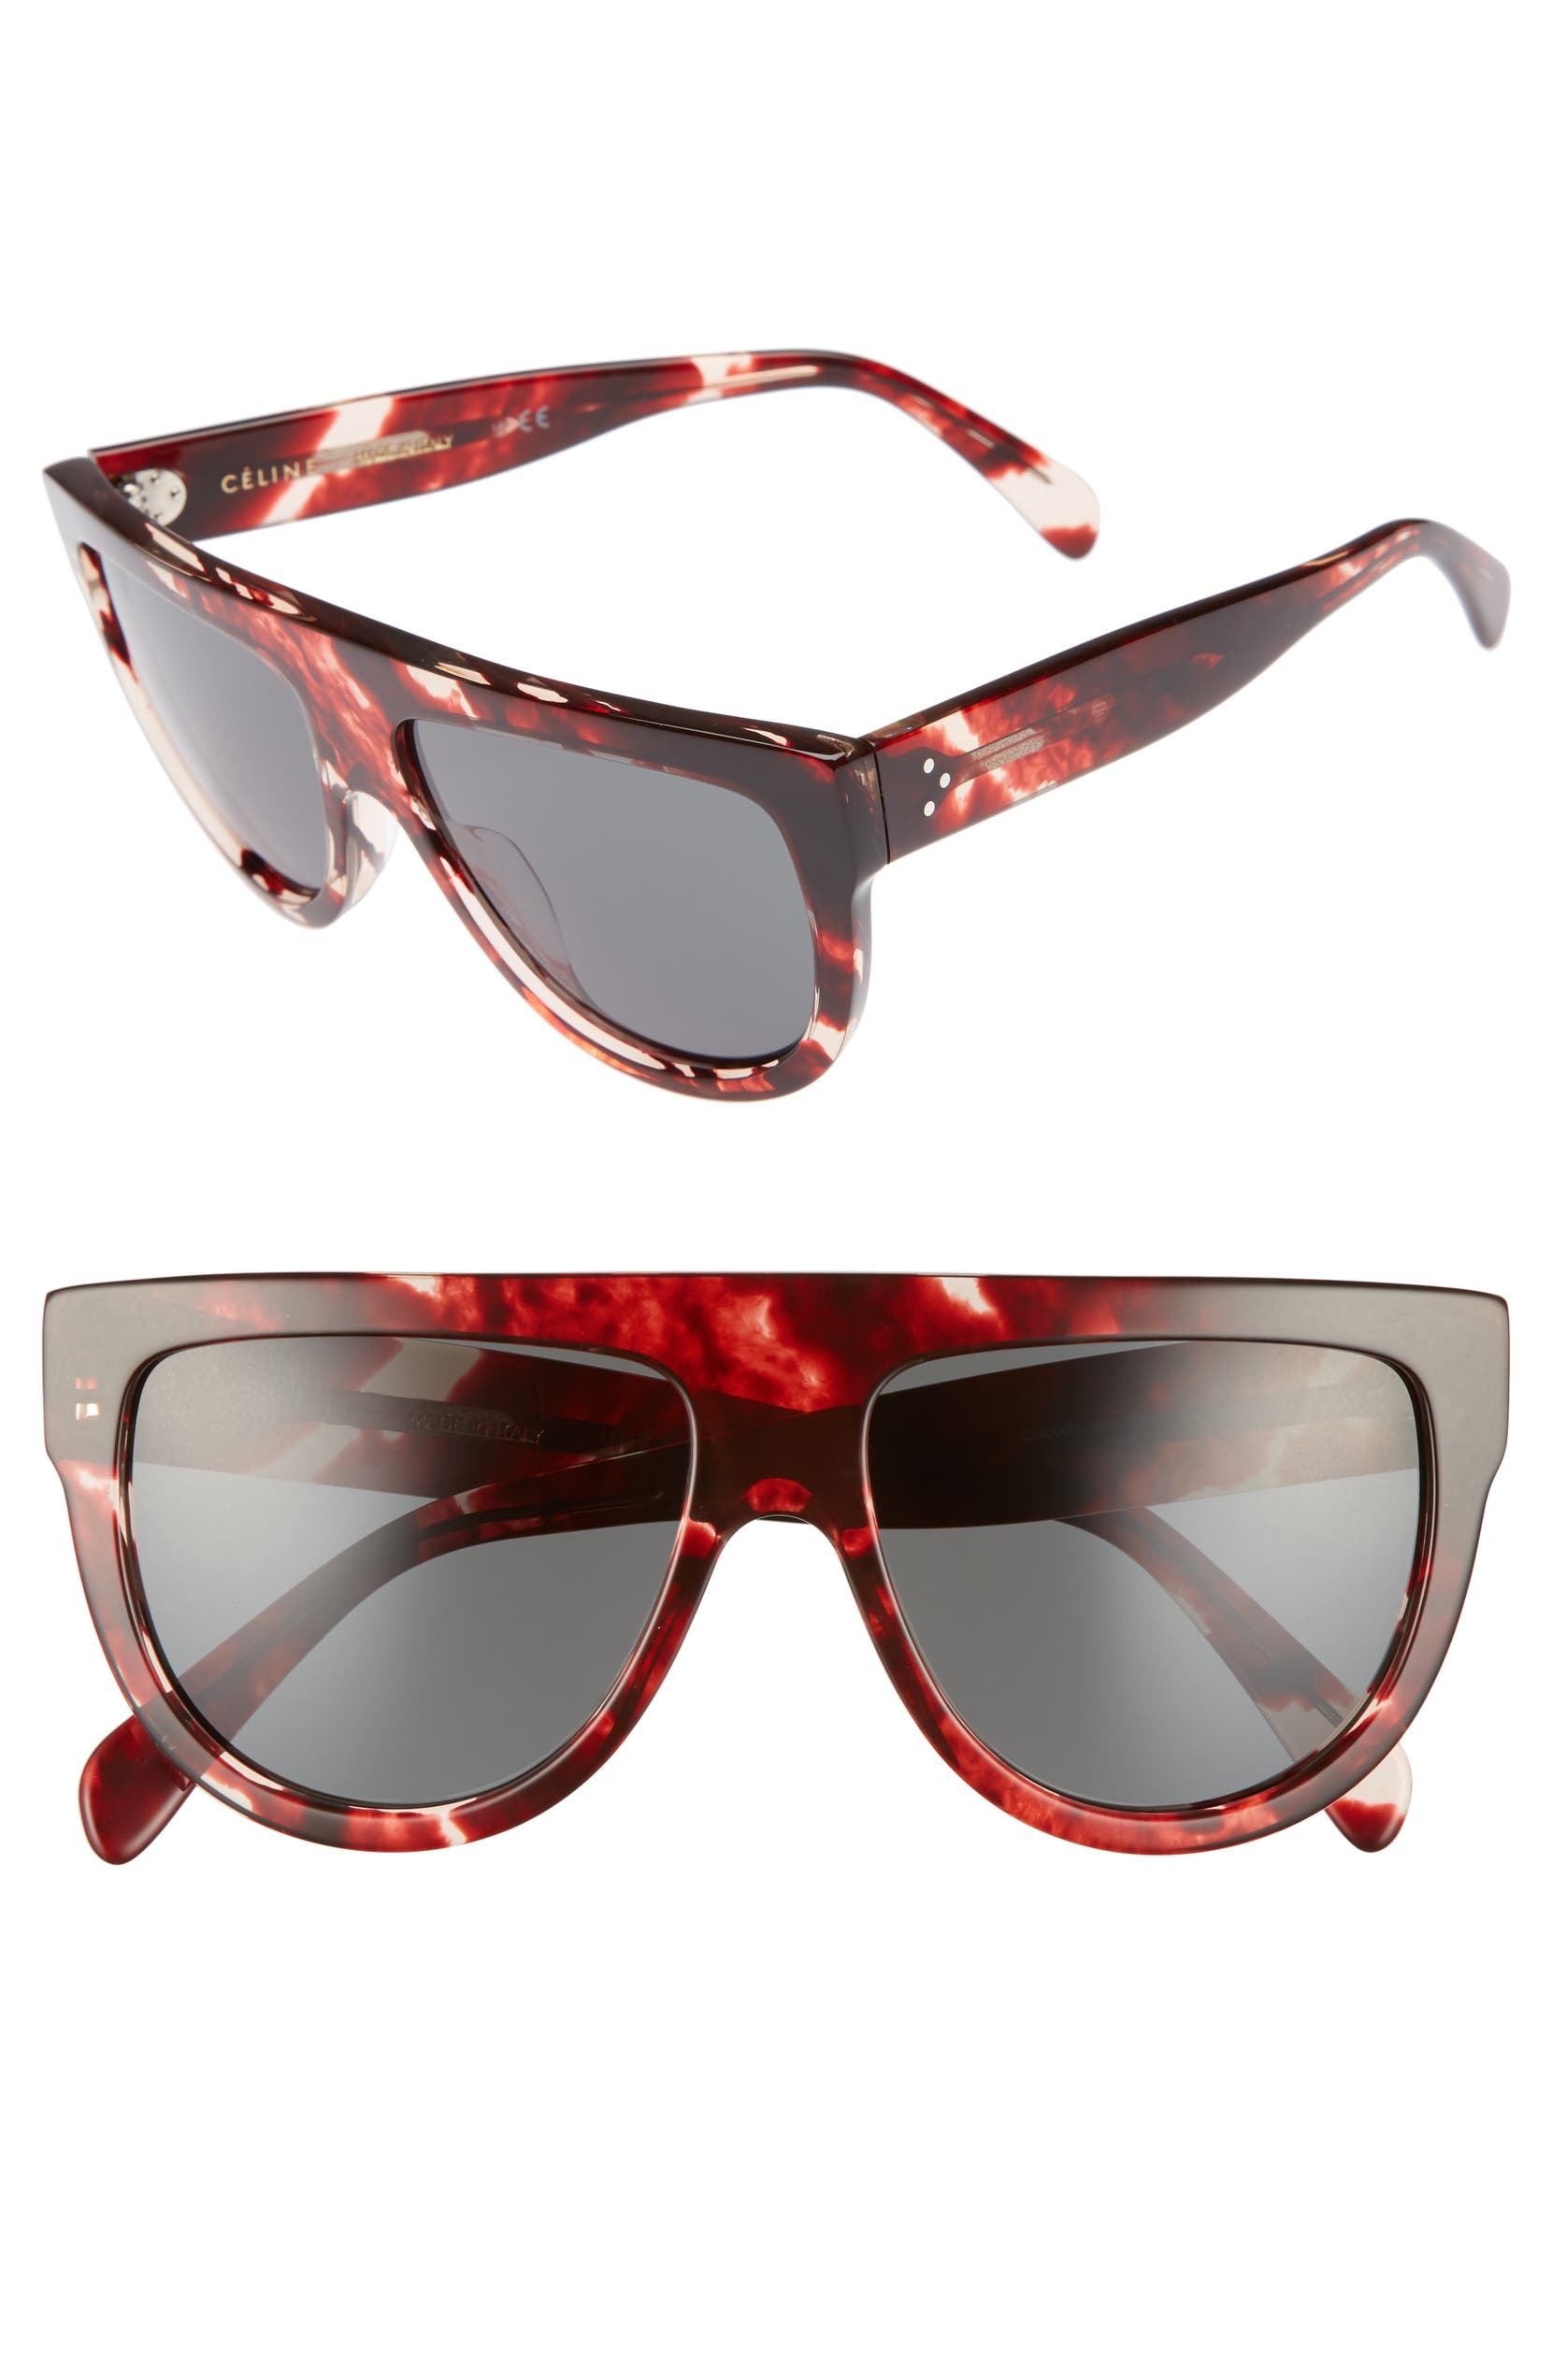 4049f3bc48 0bv8178 Cat Eye Sunglasses Source · C line Flat Top Sunglasses Nordstrom